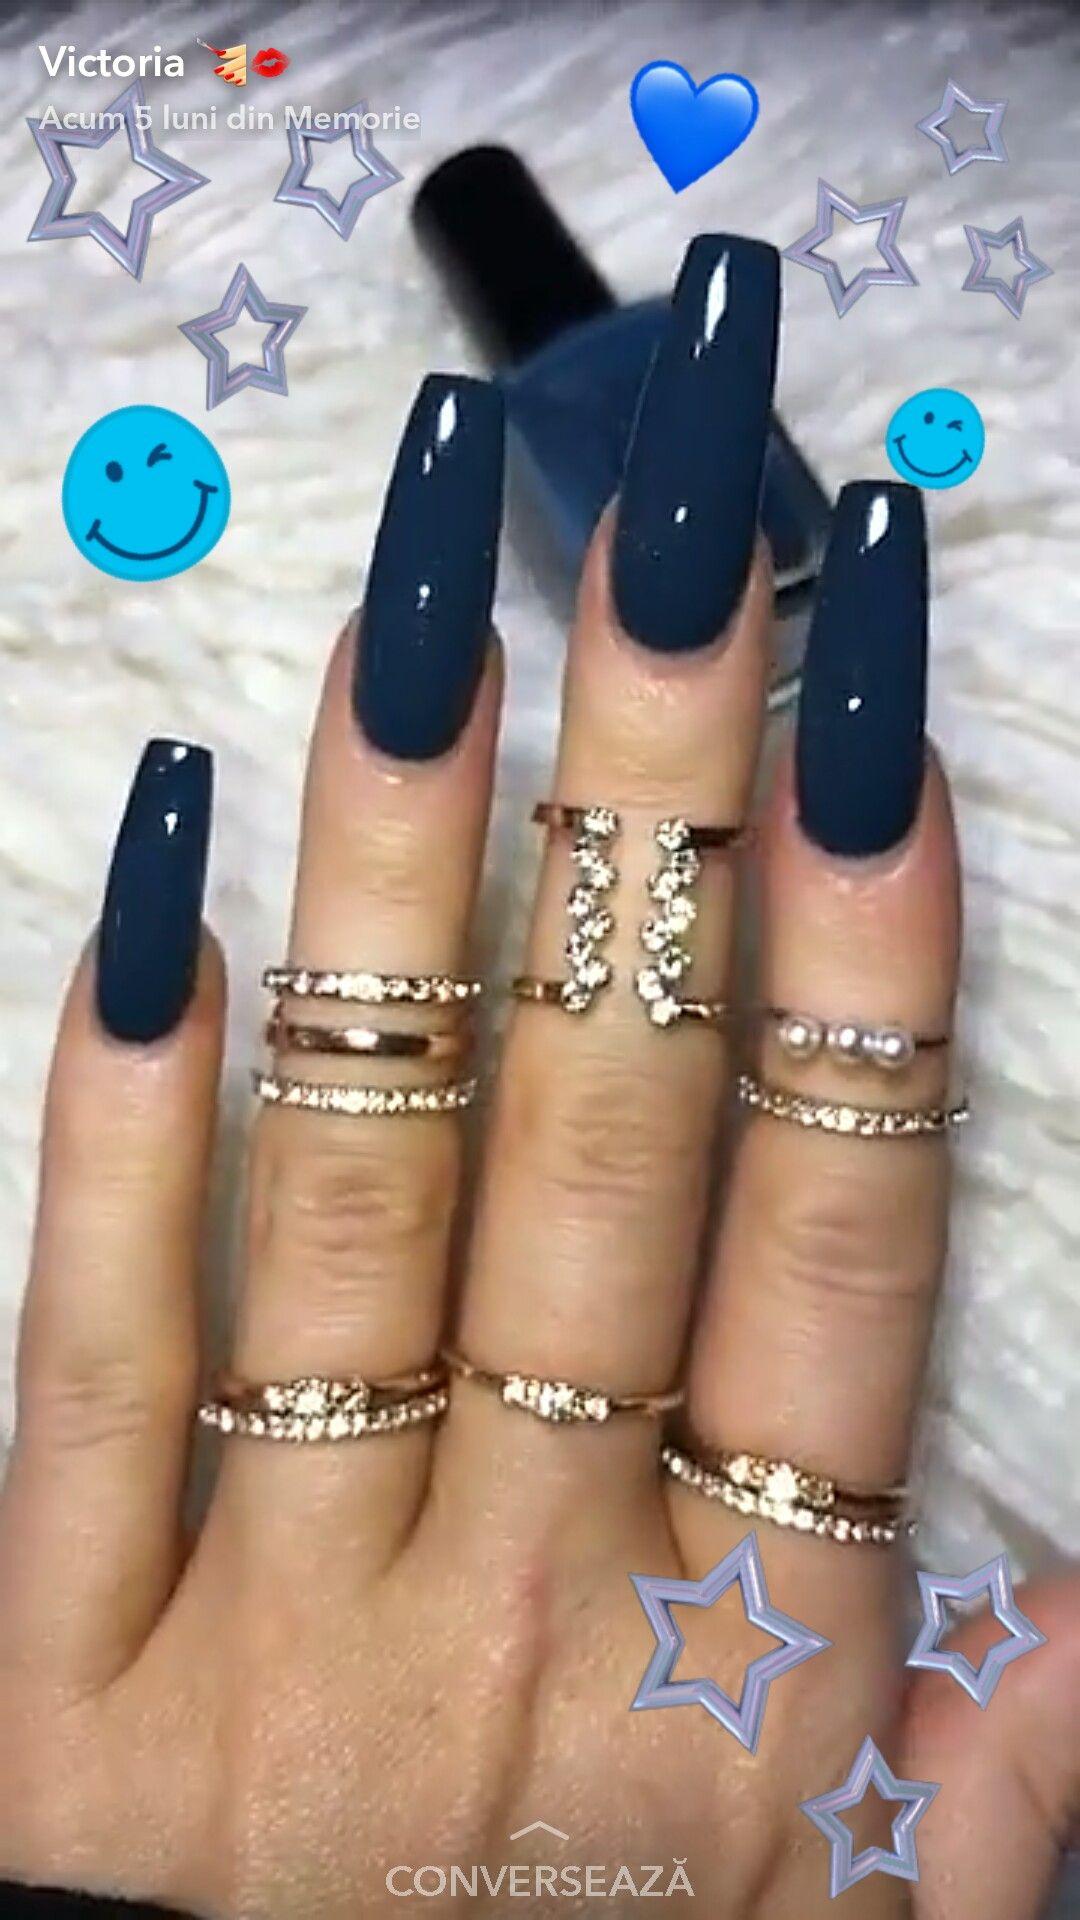 Pin by Kaylee Druen on Nails | Pinterest | Lights, Girls and Nail inspo